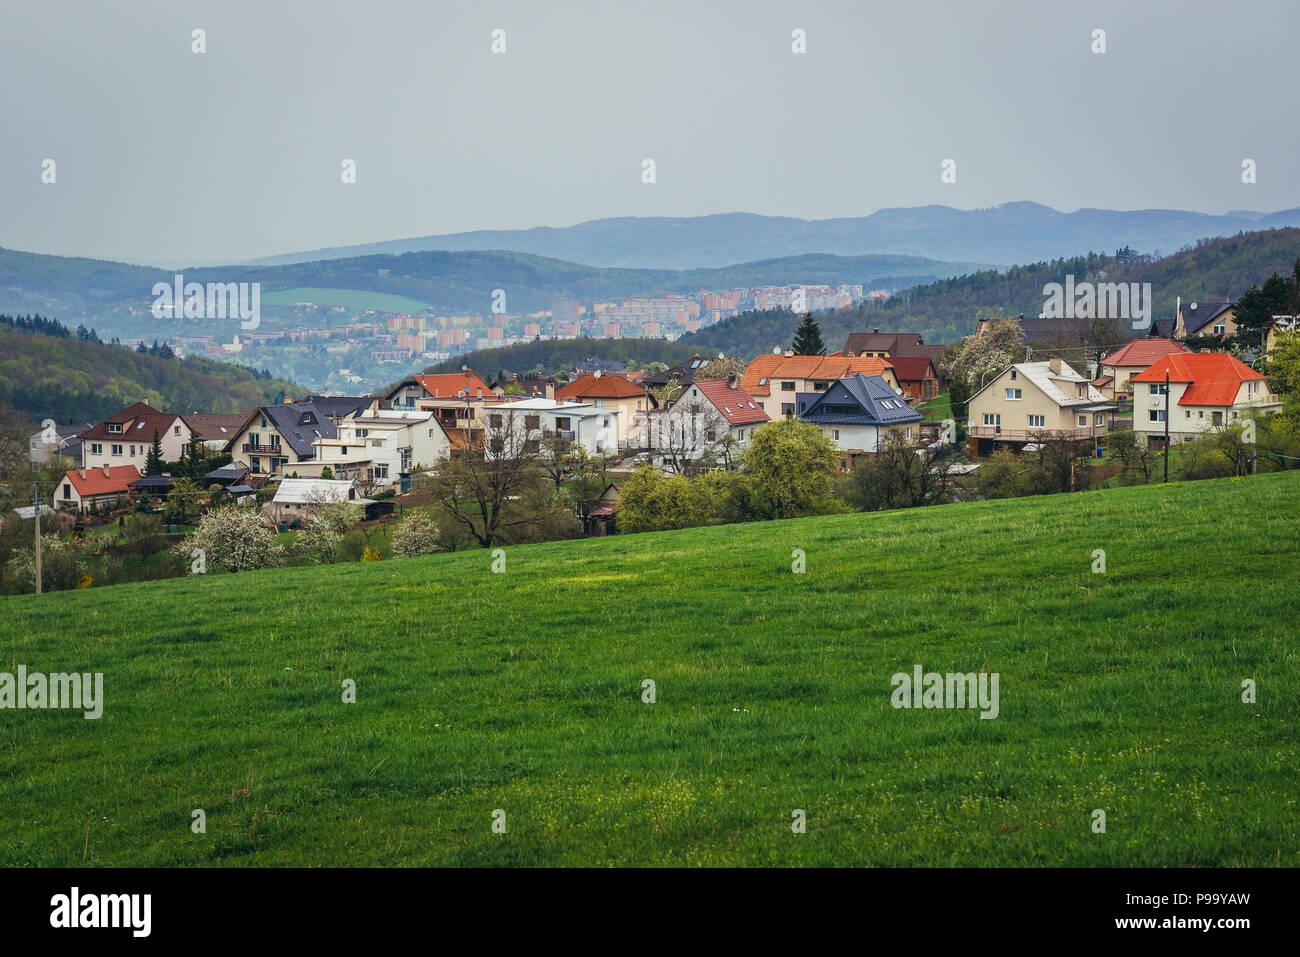 Houses in Kudlov district of Zlin city in Czech Republic - Stock Image